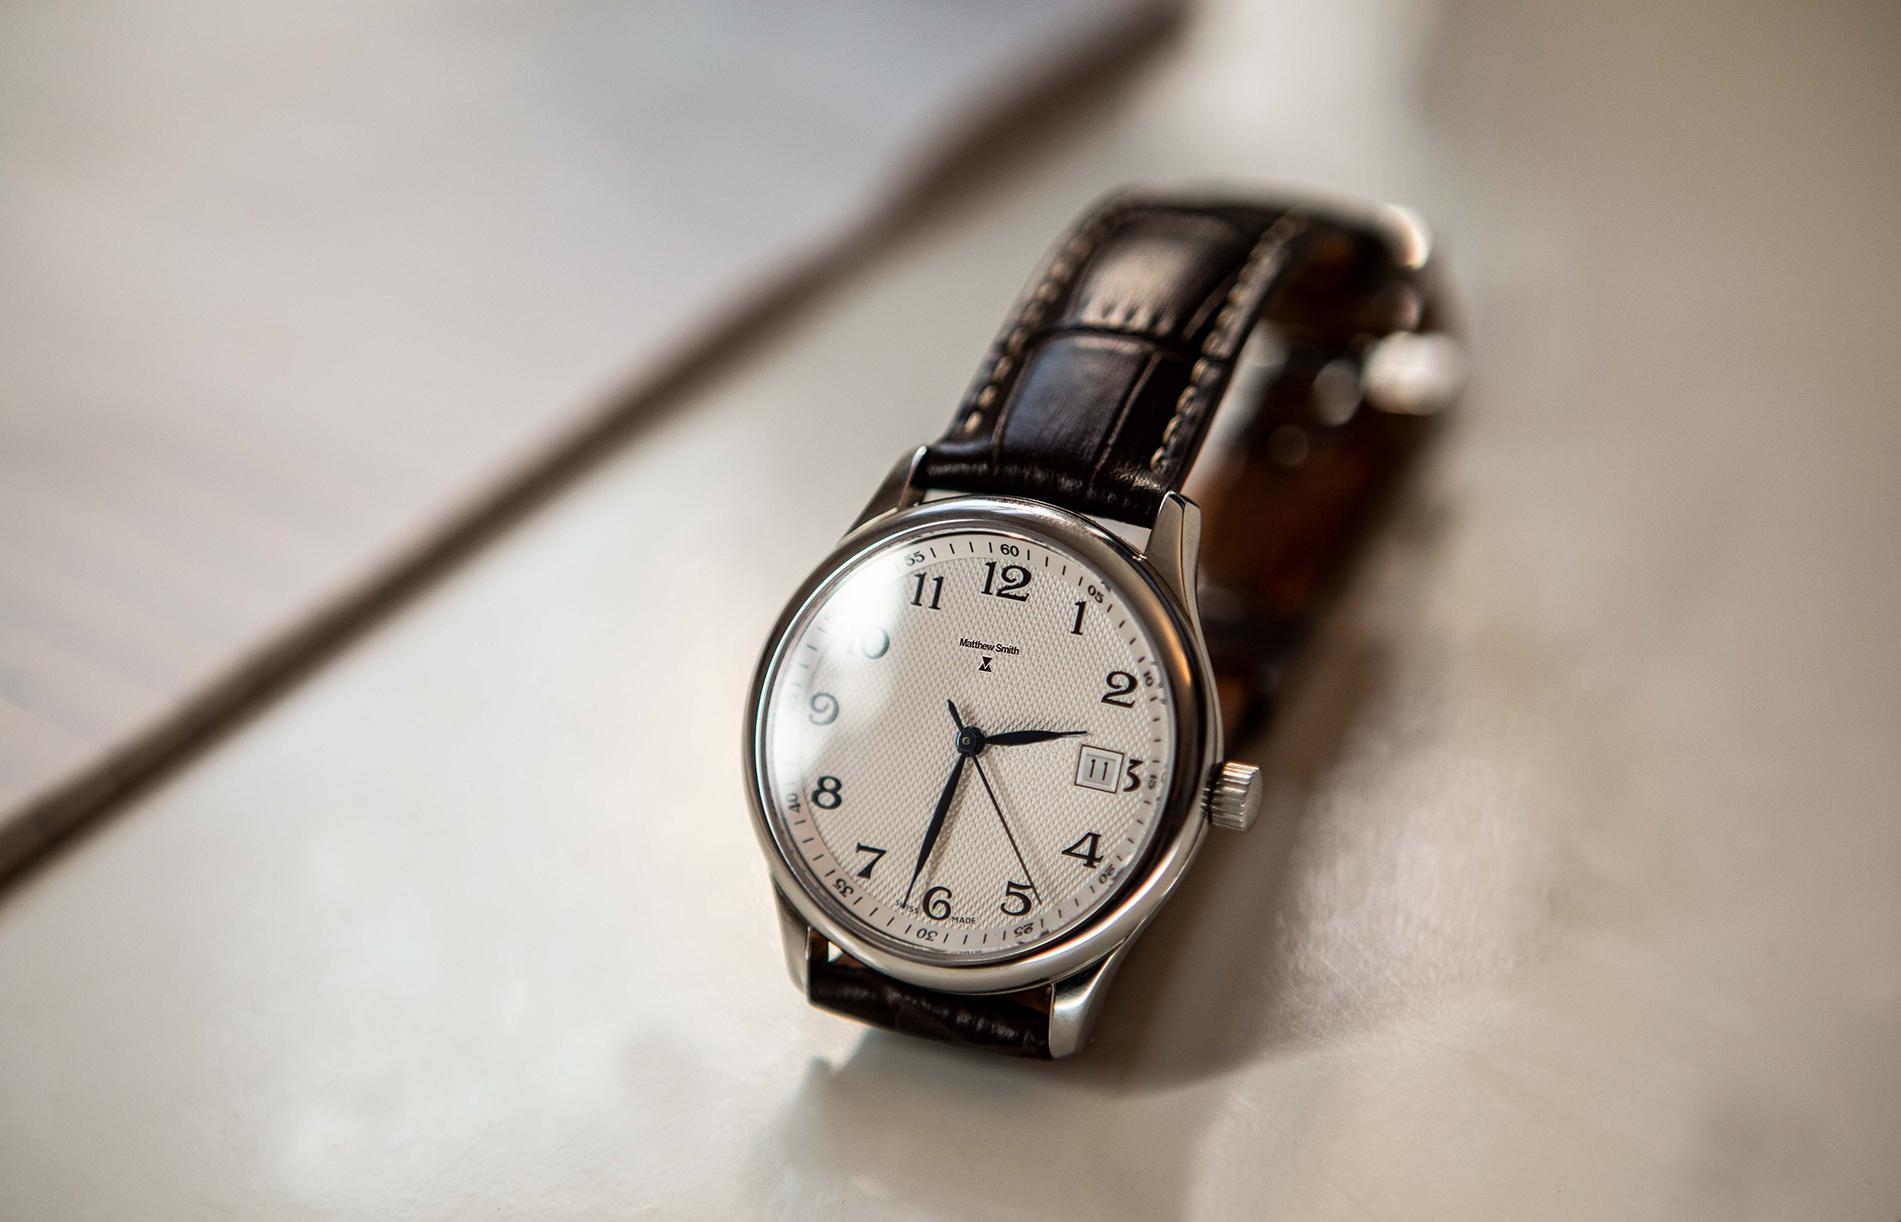 Swiss made watch Matthew Smith logo design https://www.linkedin.com/in/martin-andonov-445148163/